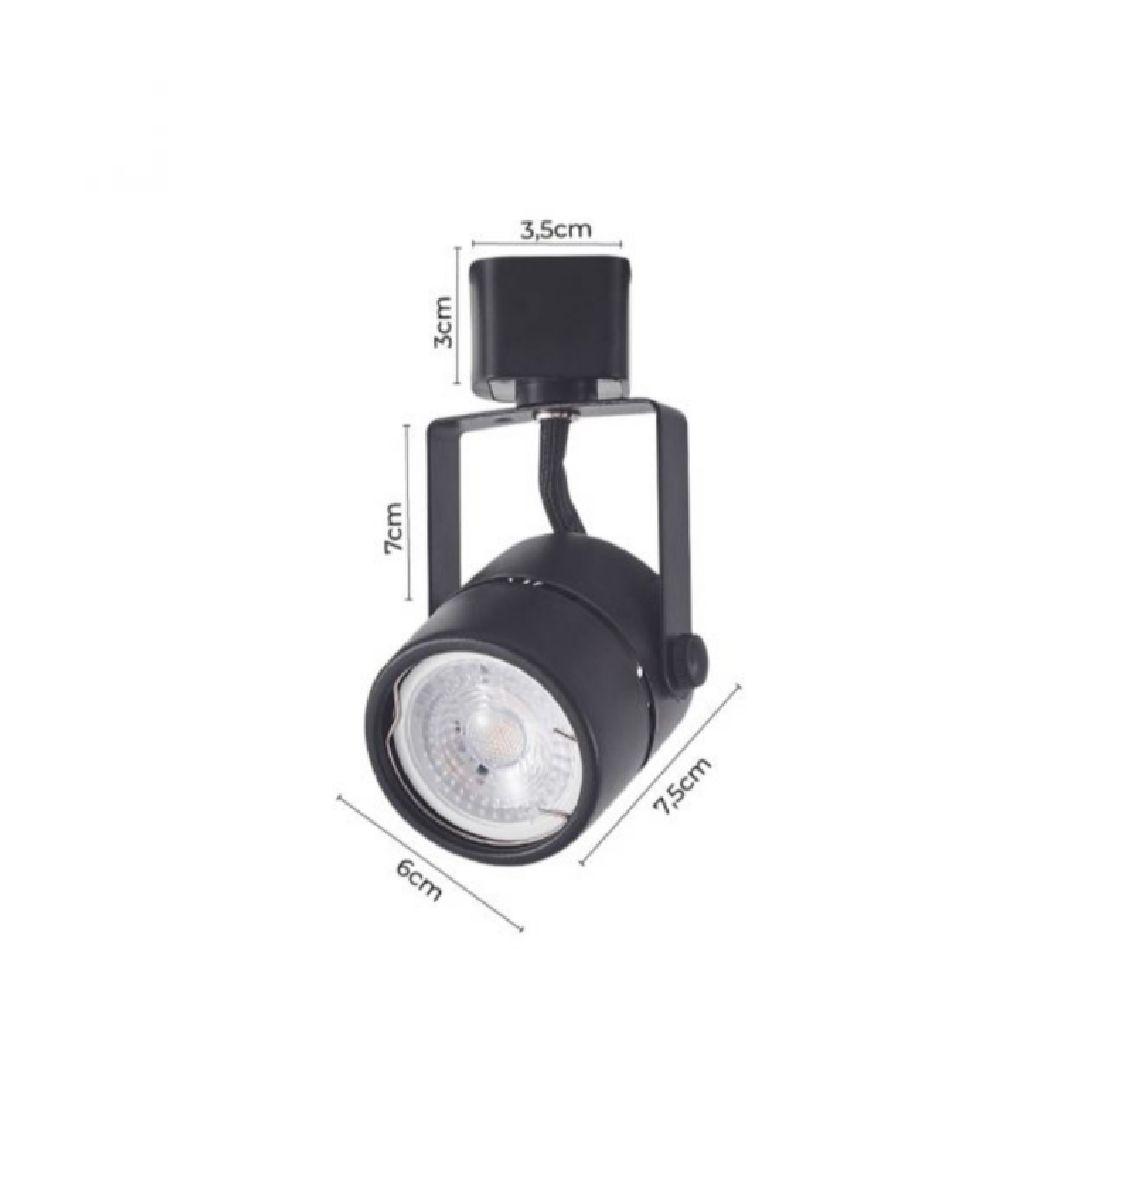 Kit Trilho Eletrificado 1,5m Preto Nordecor + 4 Spot Redondo MR16 / GU10 + Lâmp. Led Luz Quente